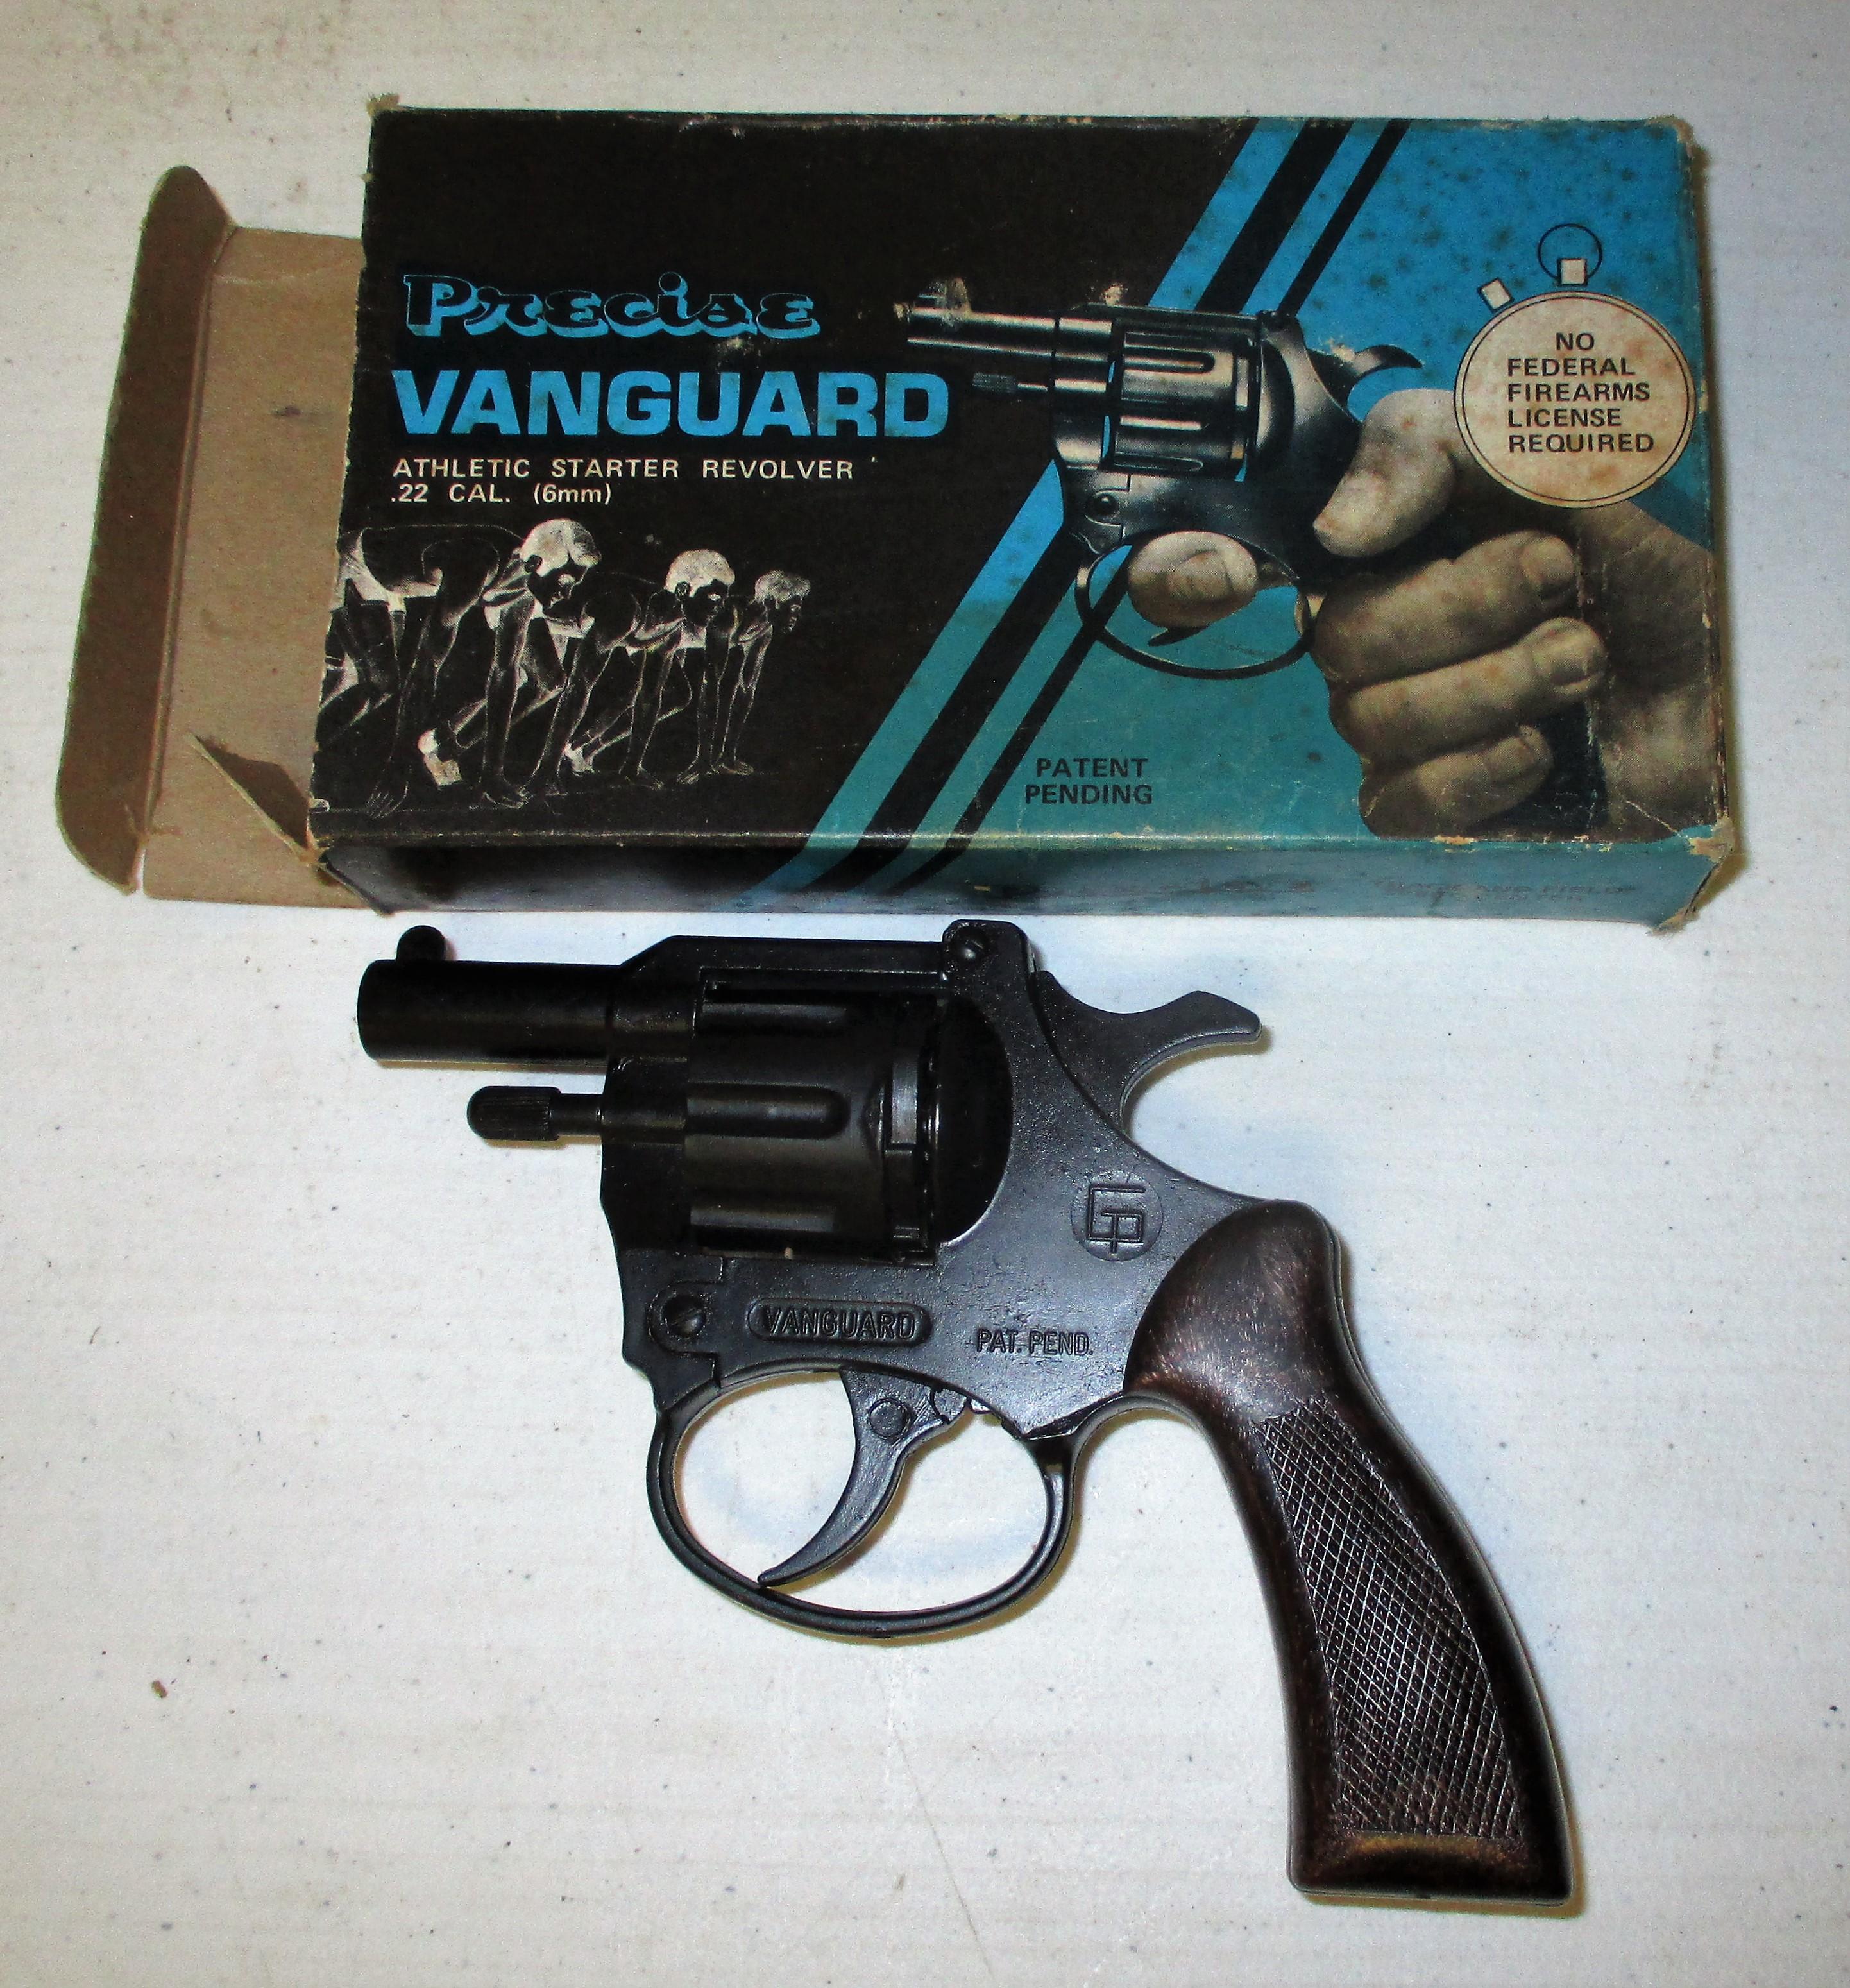 40: Vanguard Starter Revolver